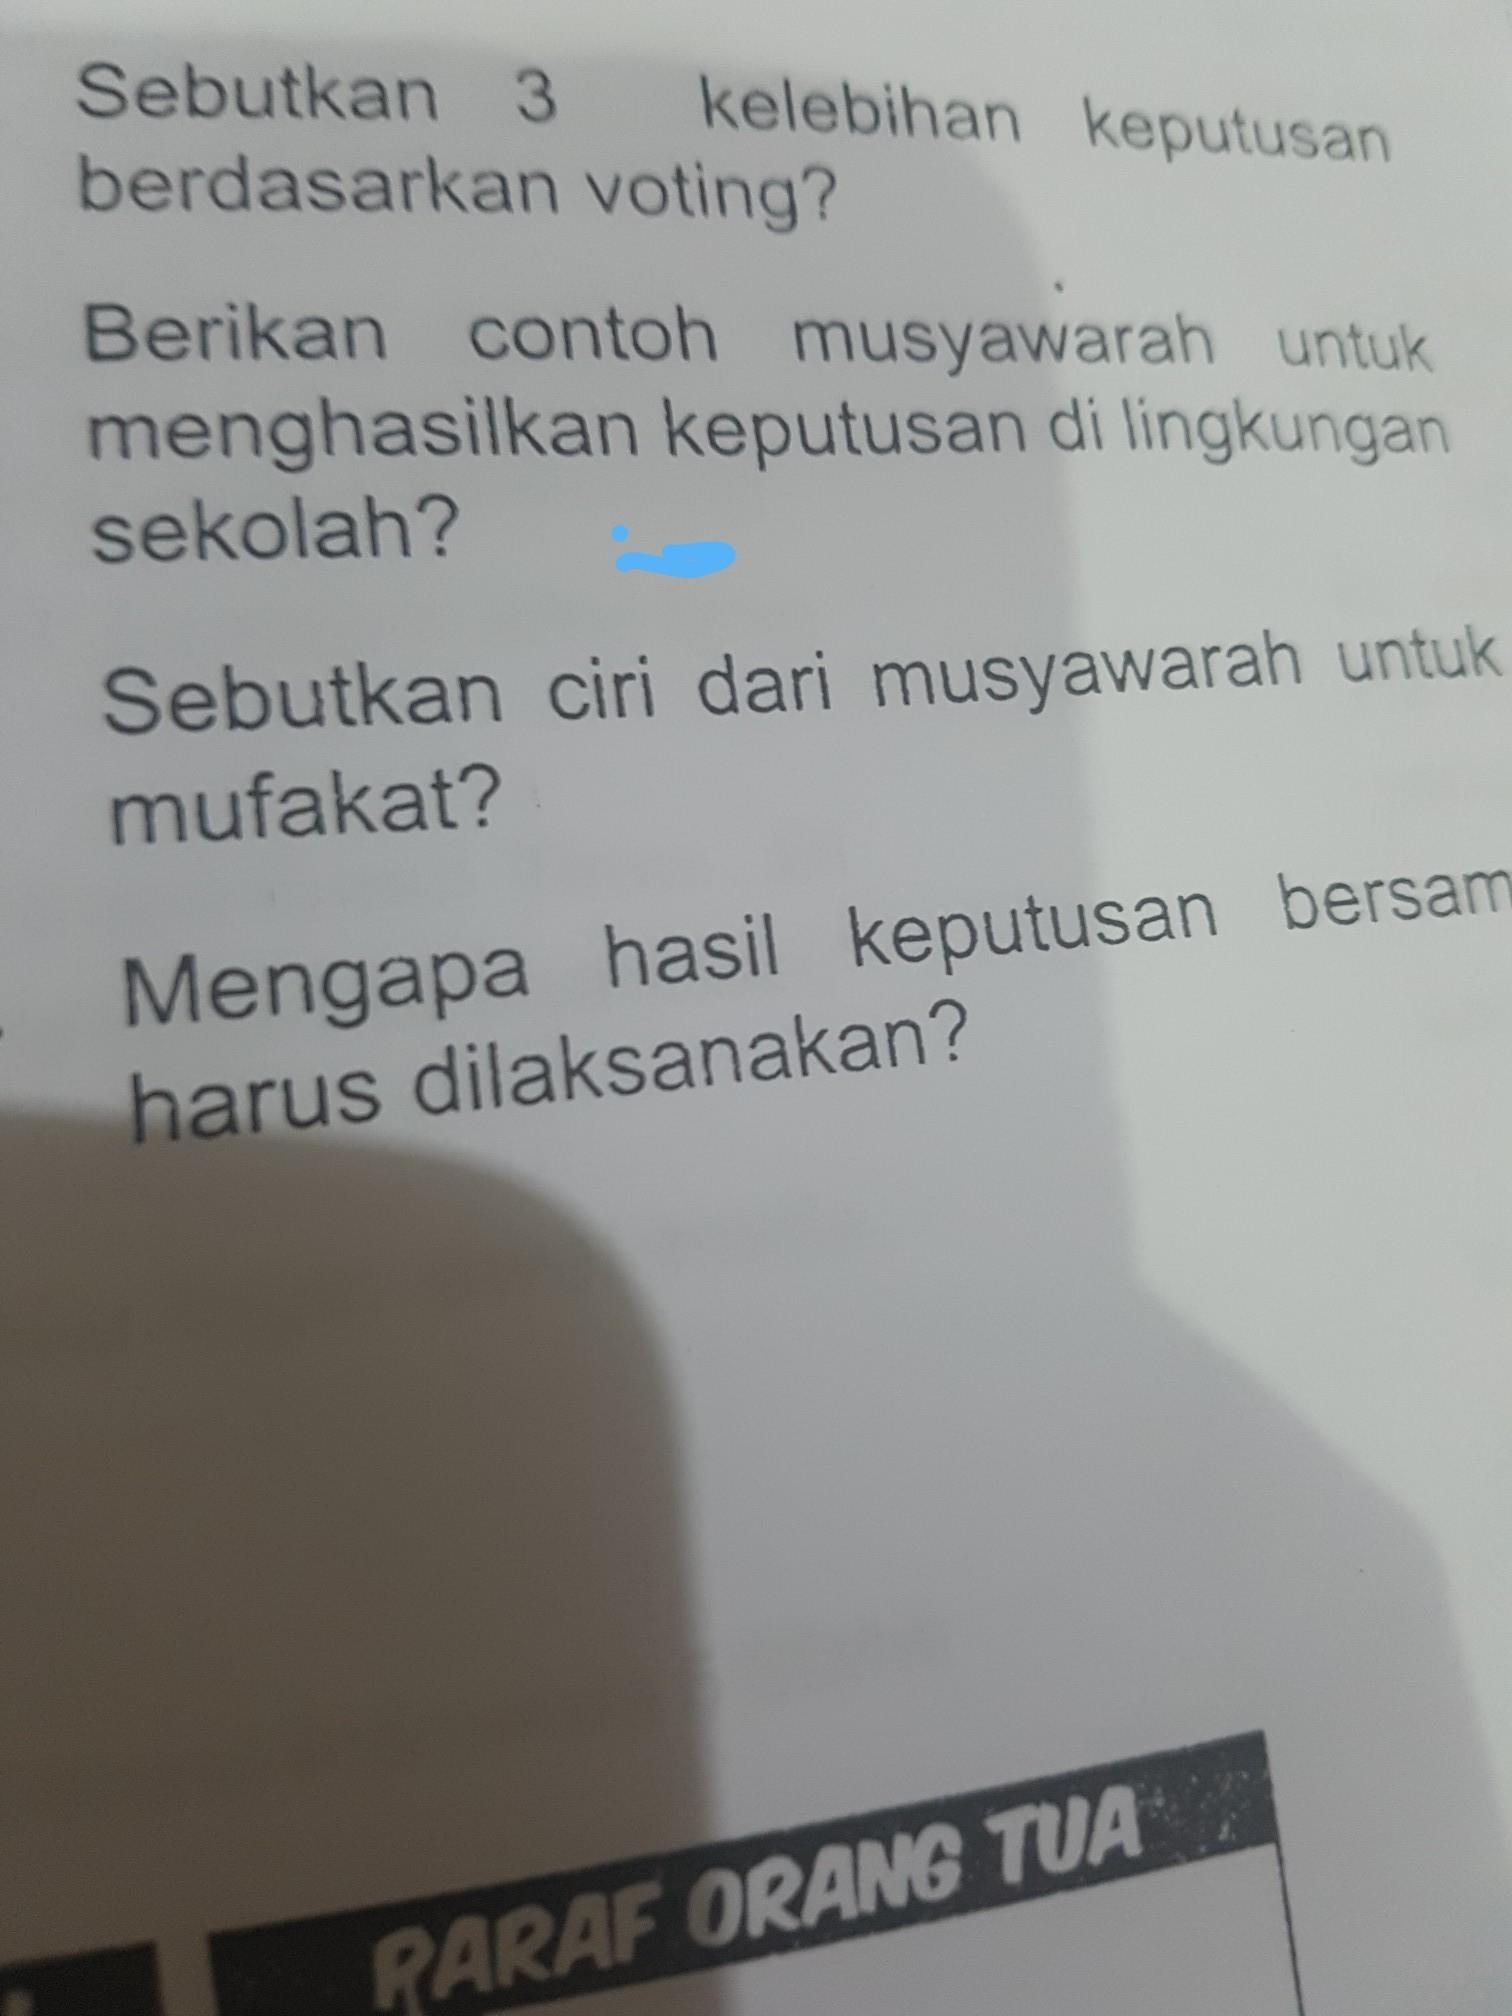 Contoh Musyawarah Di Sekolah : contoh, musyawarah, sekolah, Berikan, Contoh, Musyawarah, Untuk, Menghasilkan, Keputusan, Lingkungan, Sekolah, Brainly.co.id